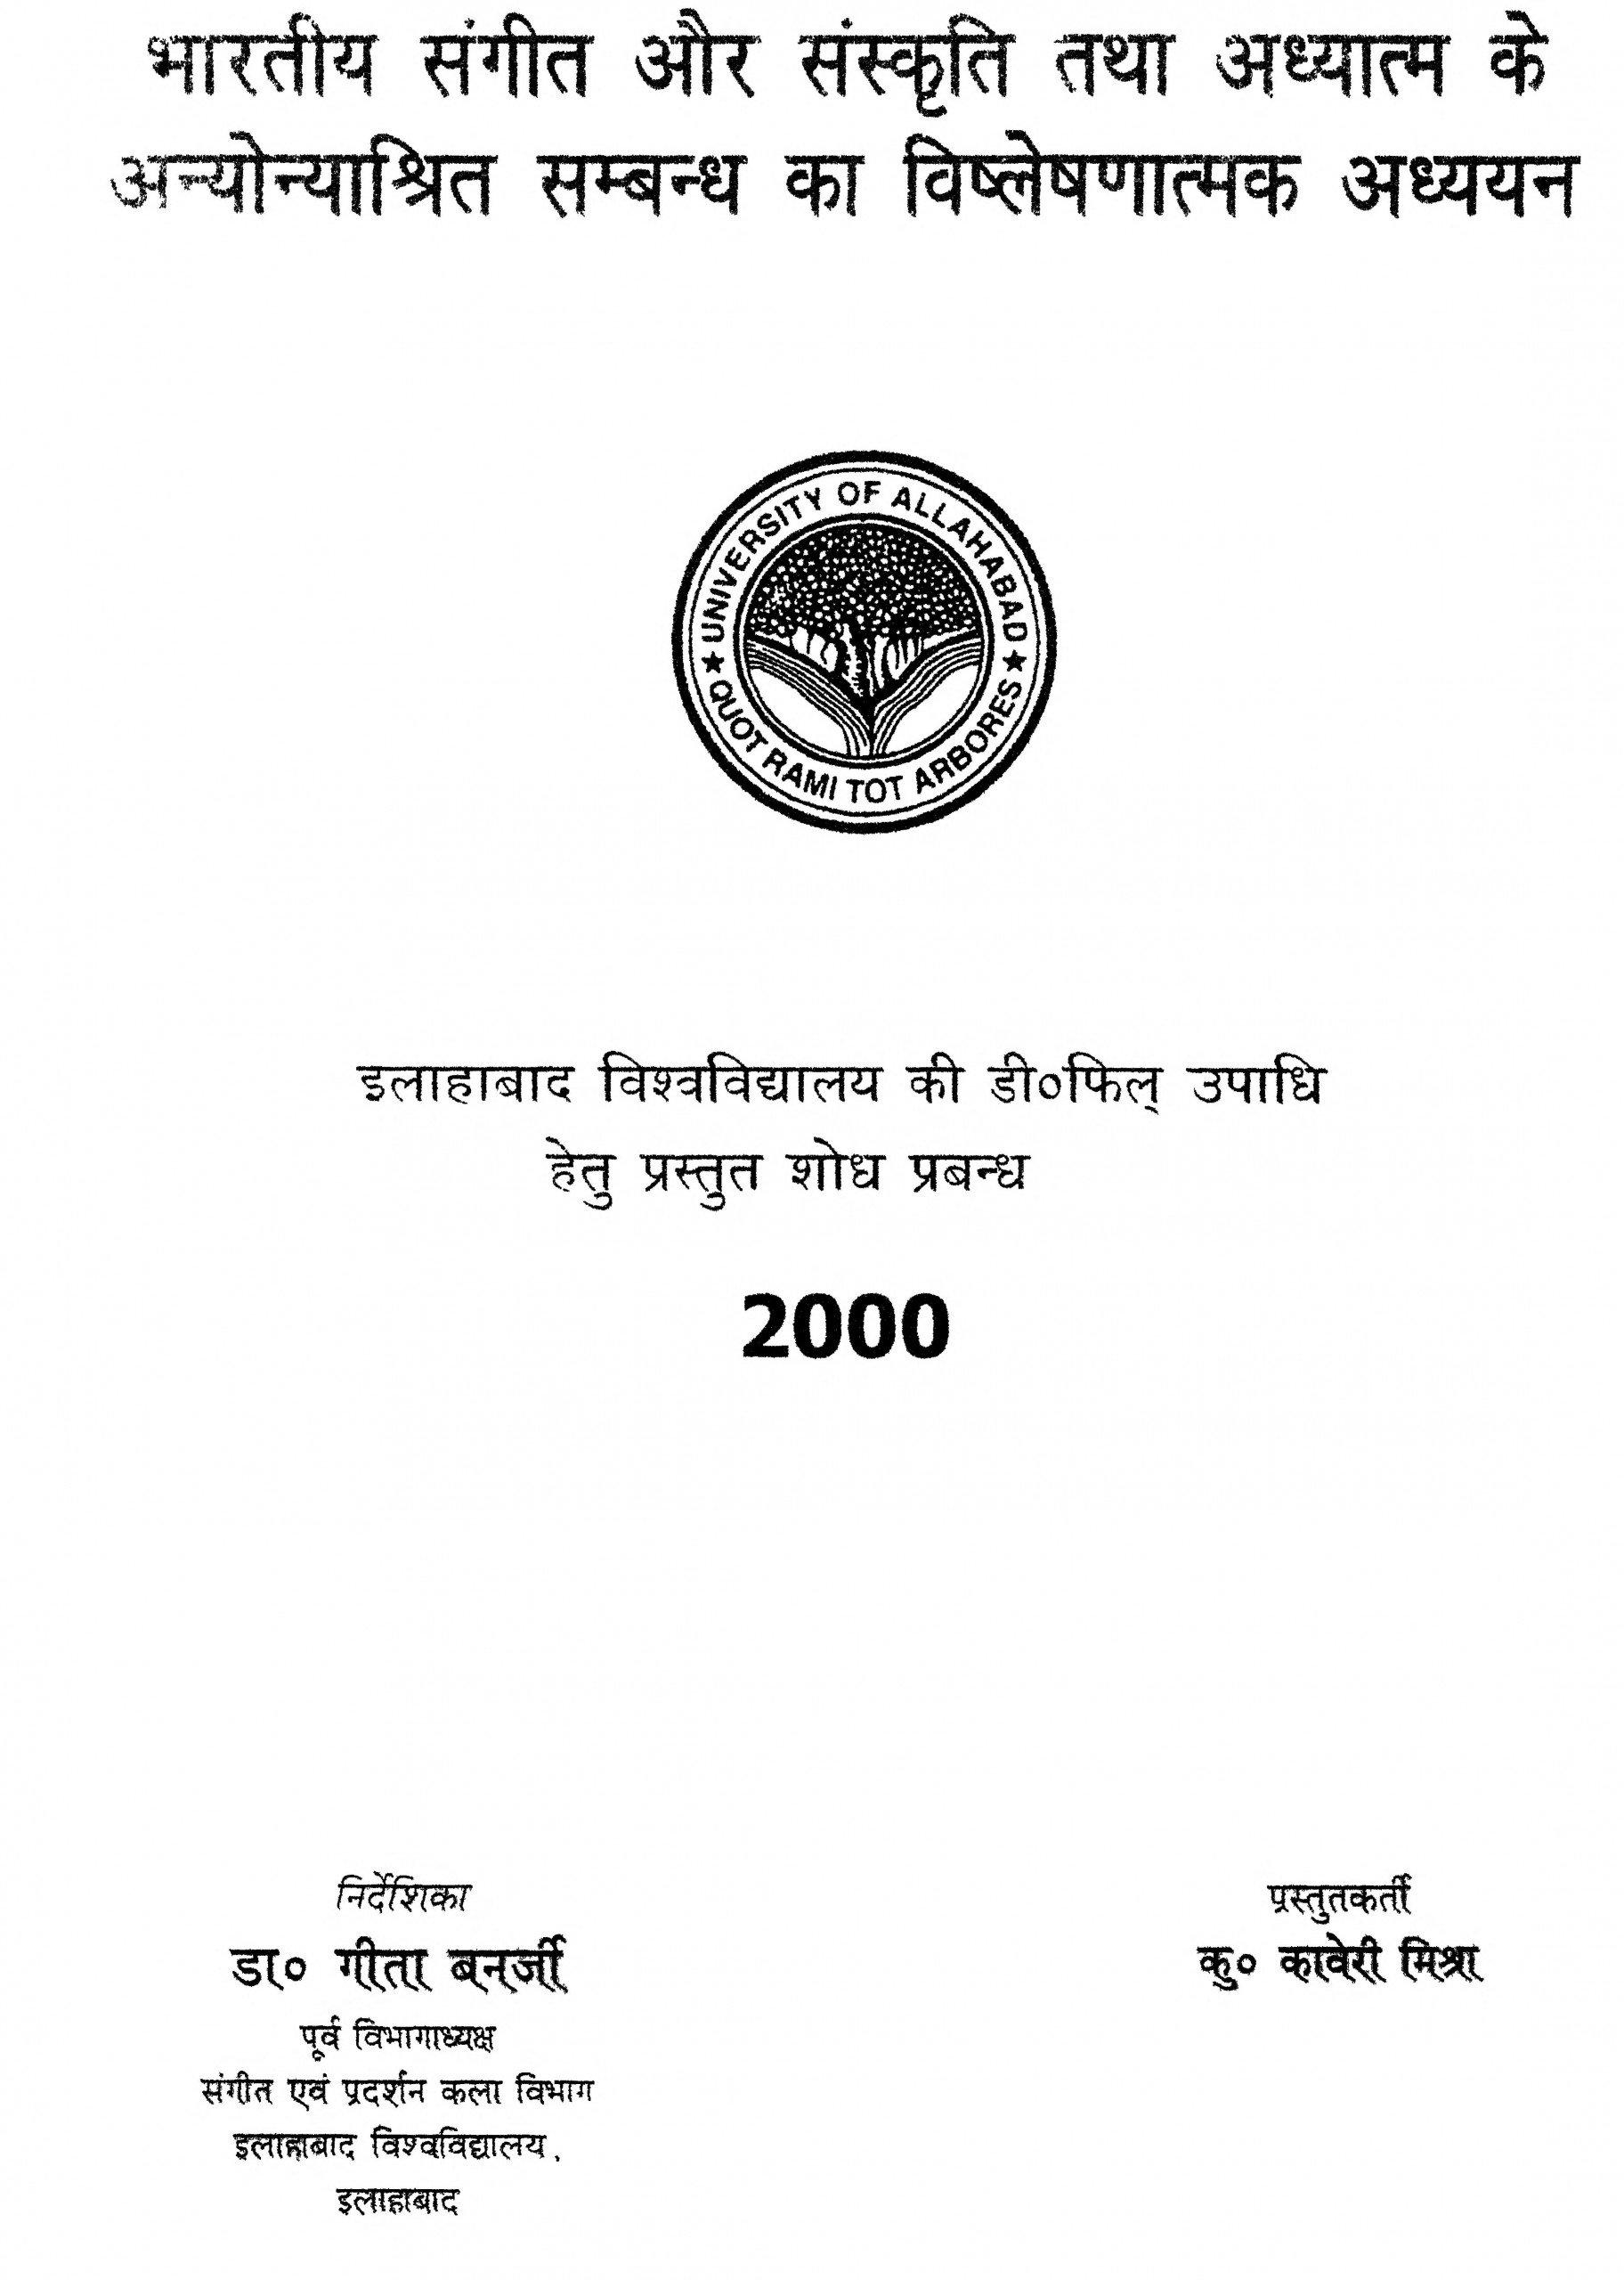 Book Image : भारतीय संगीत और संस्कृति तथा अध्यात्म के अन्योन्याश्रित सम्बन्ध का विश्लेषणात्मक अध्ययन  - Bharteey Sangeet Aur Sanskriti Tatha Adhyatm Ke Anyonyashrit Sambandh Ka Vishleshnatmak Adhyayan